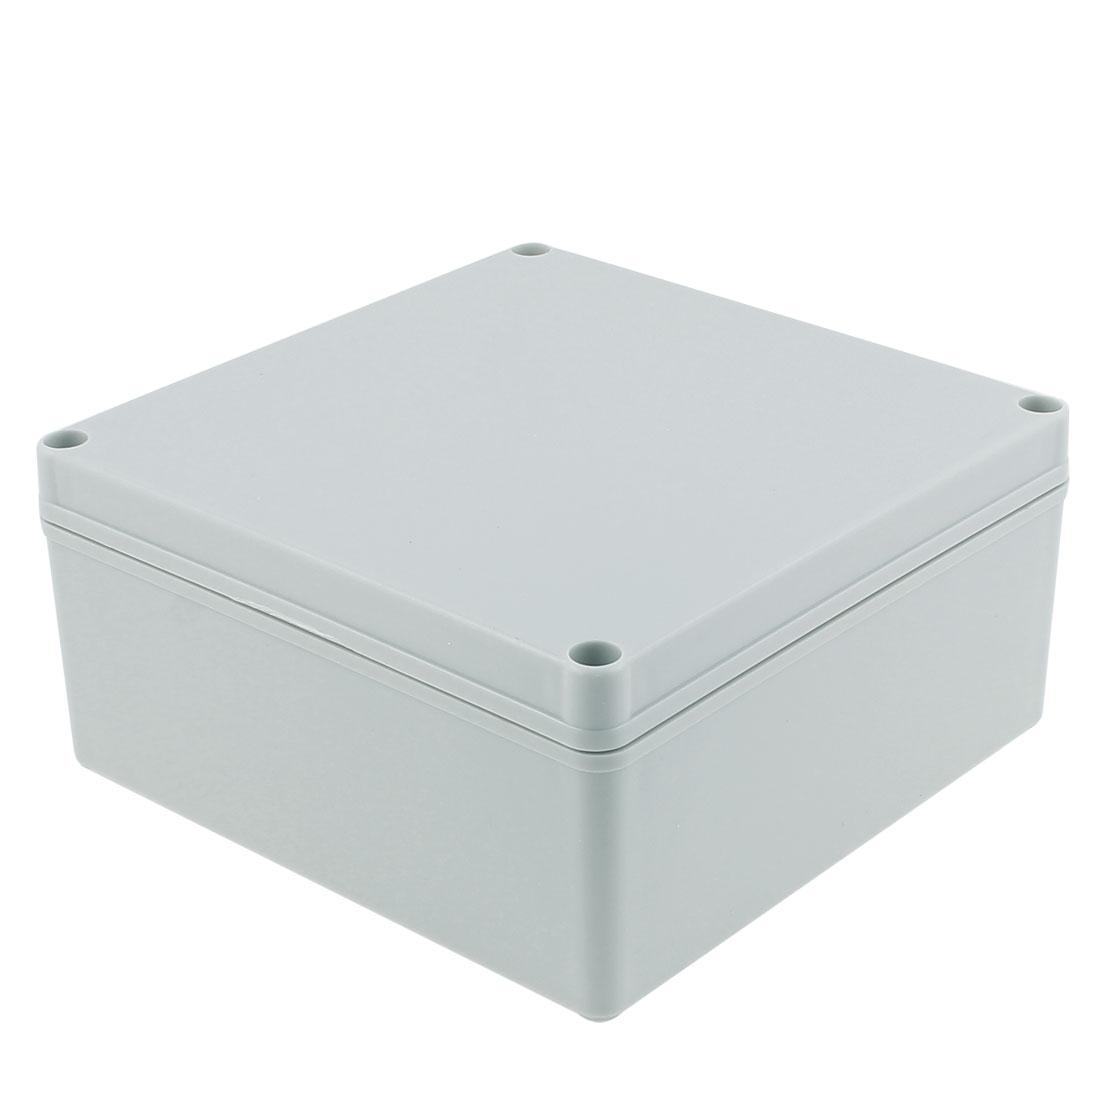 200 x 200 x 95mm Dustproof IP65 Junction Box Terminal Connection Box Enclosure